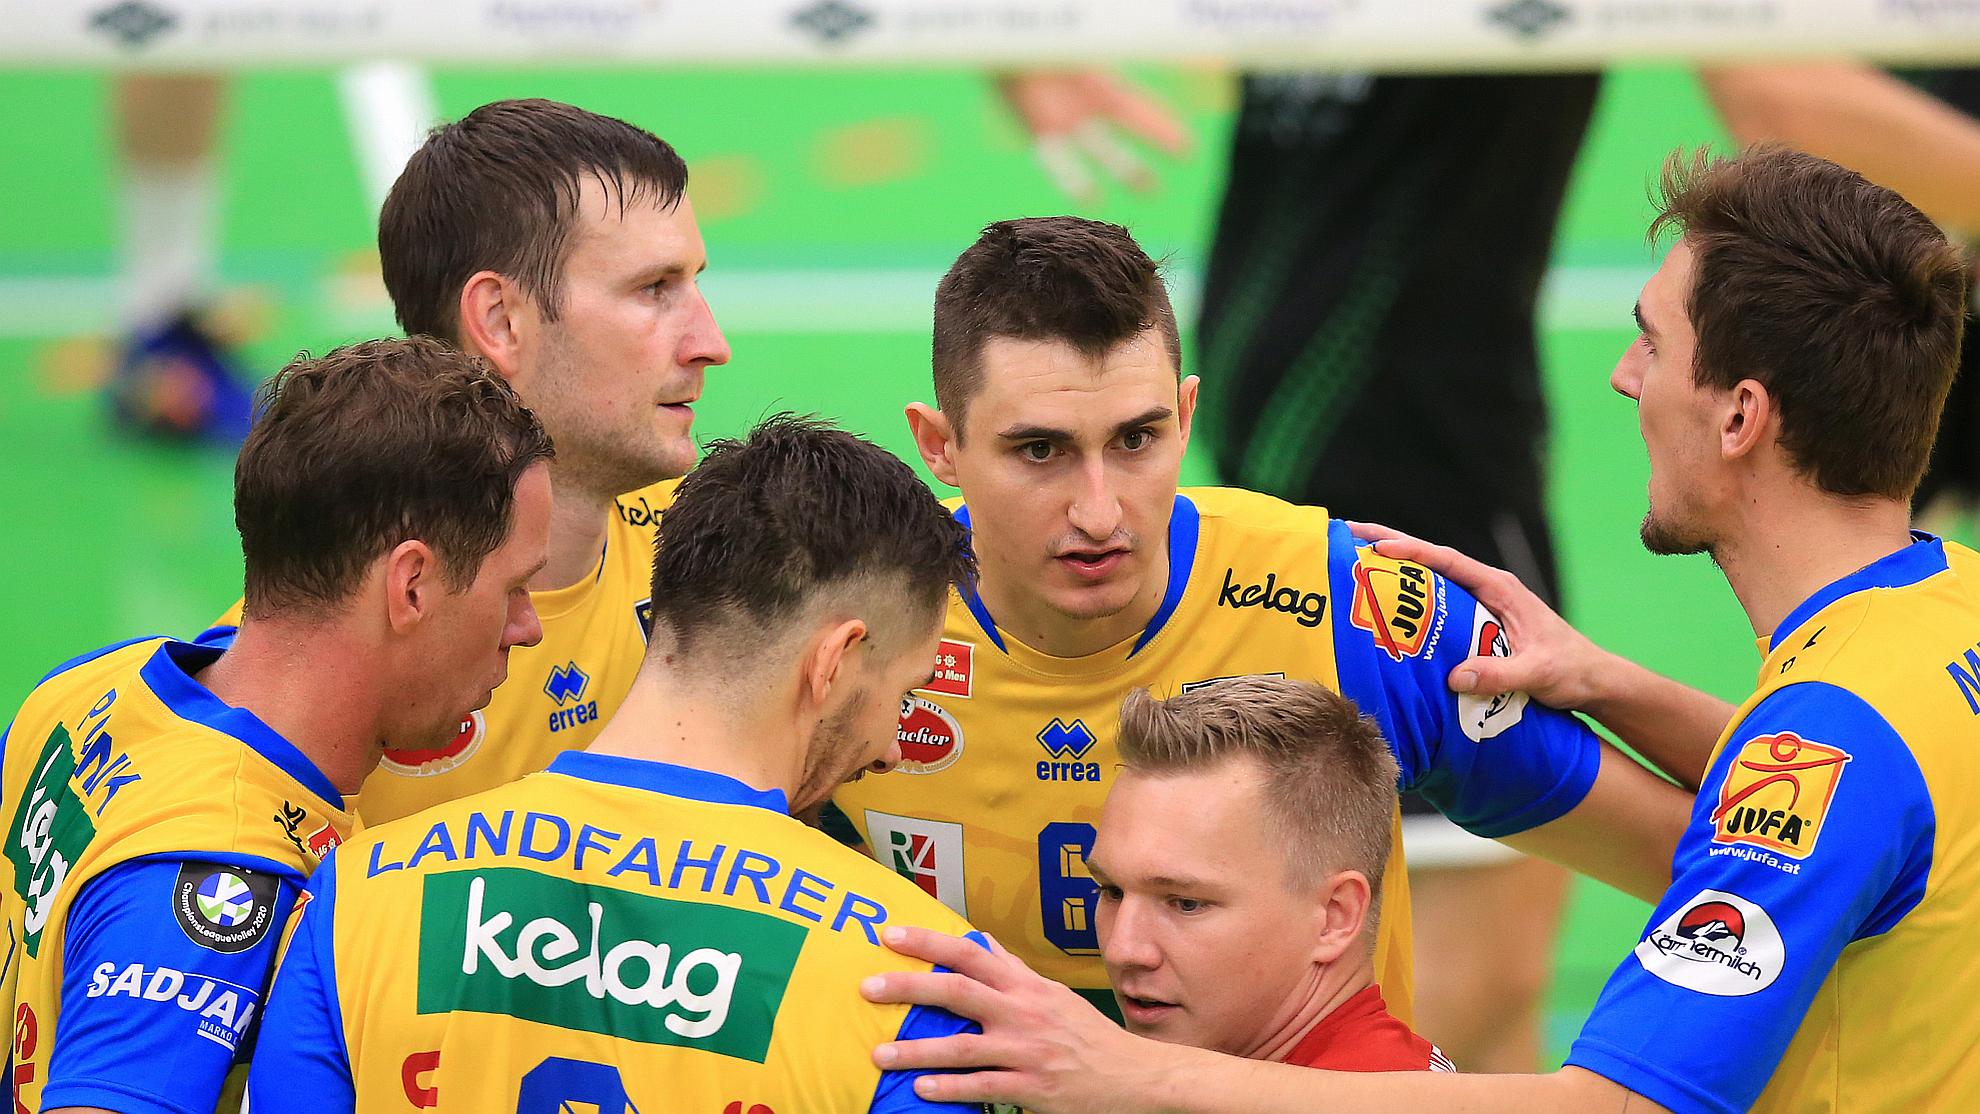 SK Zadruga Aich/Dob 2019 - FOTO © GEPA pictures/Mario Bühner